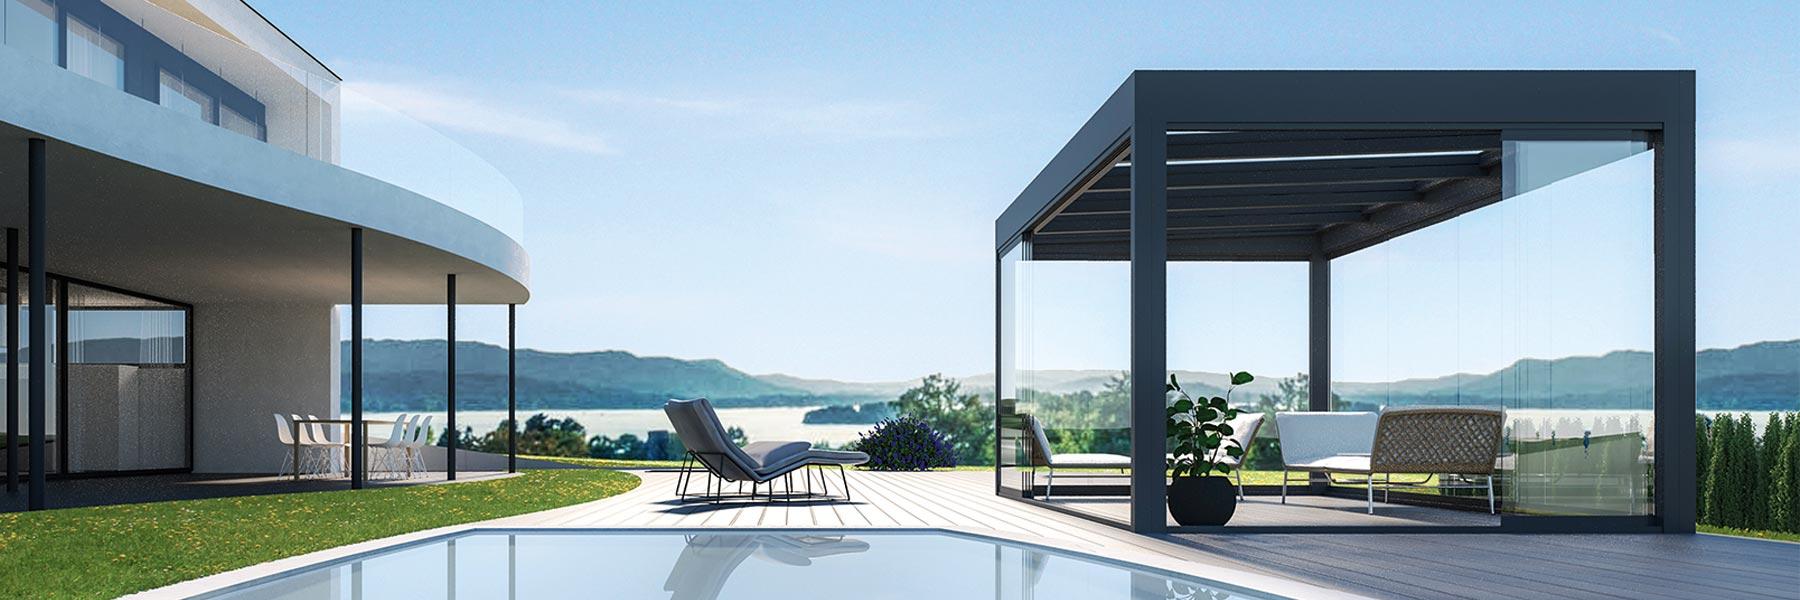 Slider Hawaii 40 CUBO Terrassendach Glasdach Terrassenverglasung Terrassenüberdachung Modern Pergola Glascubus Freistehend überdachung